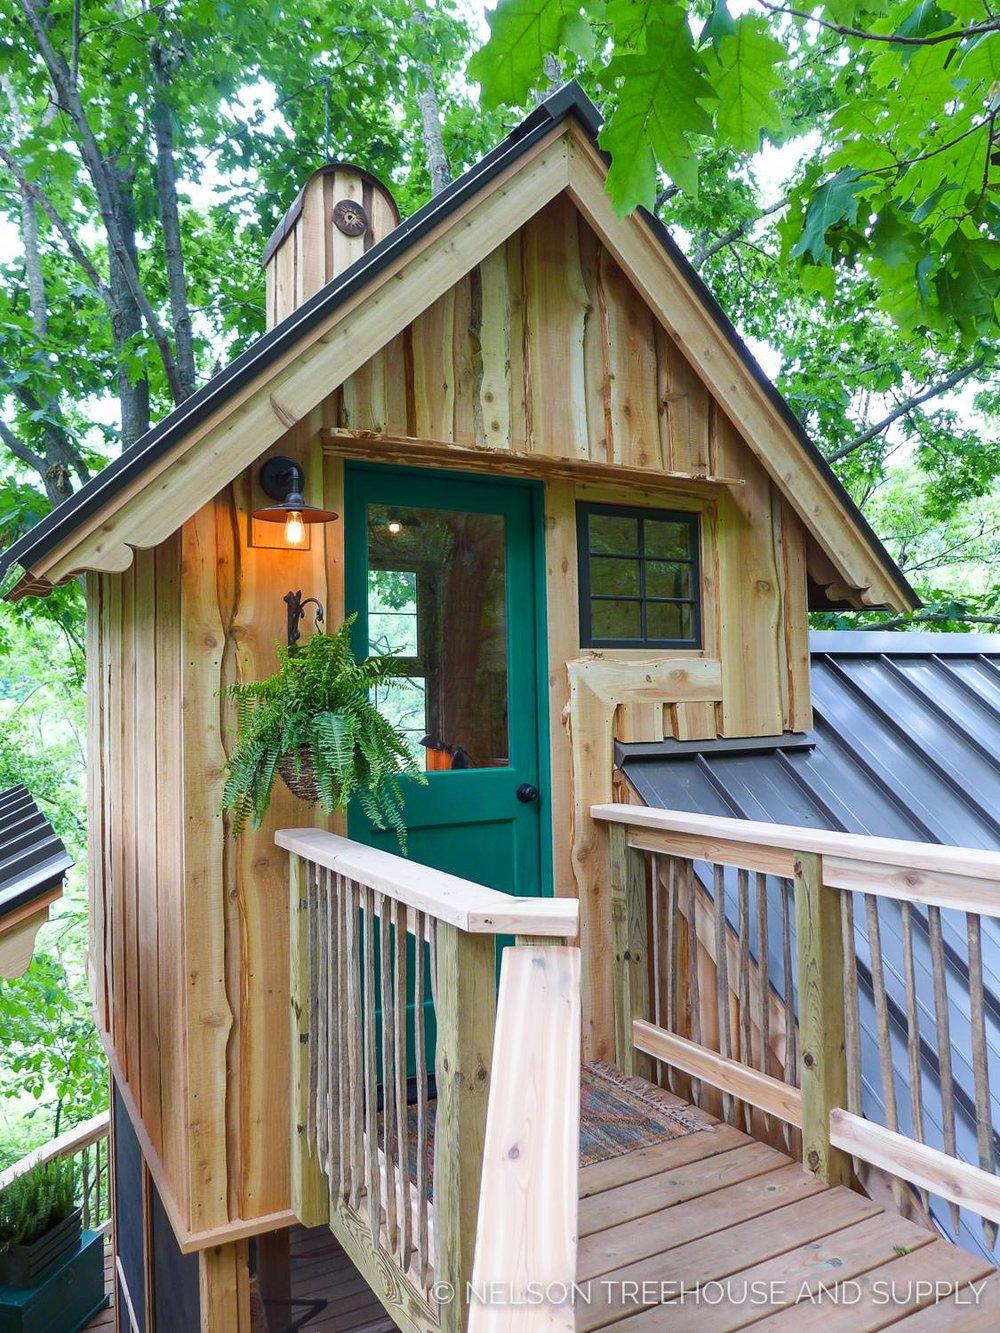 birdhouse_nelson_treehouse_2017-34.jpg